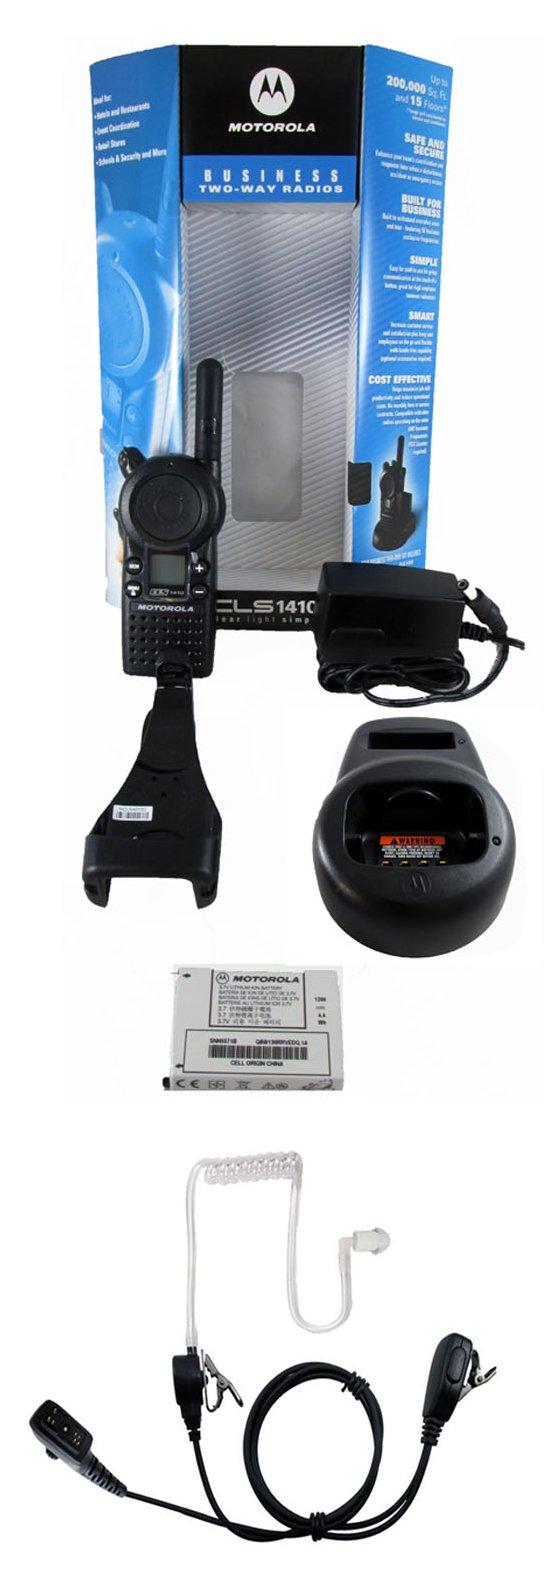 Motorola CLS1410 1 watt 4 channel business radio and Surveillance Headset